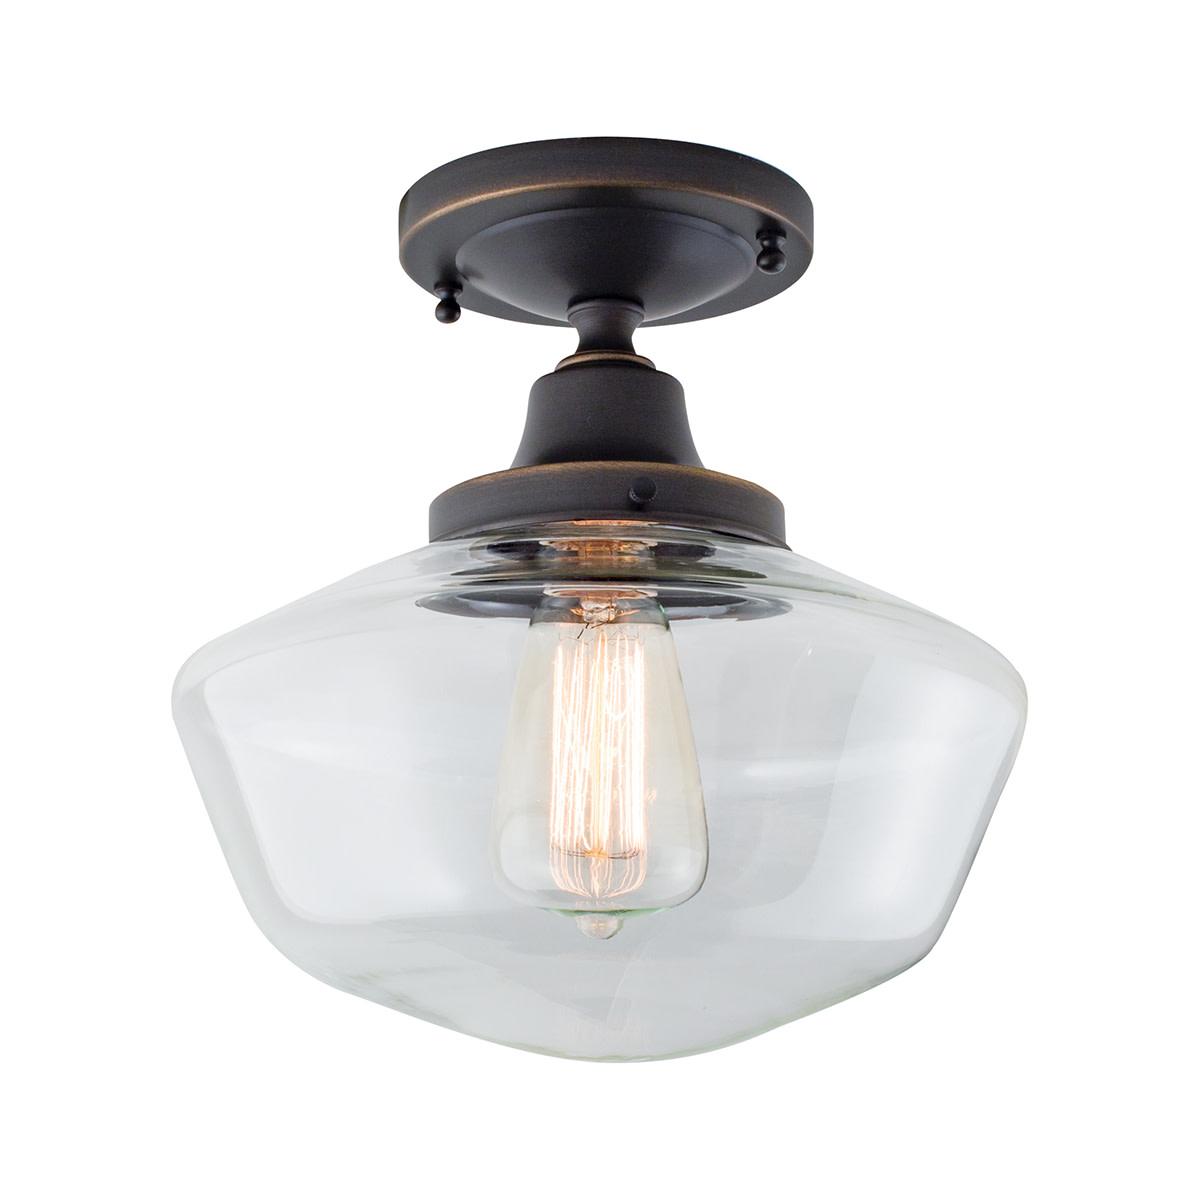 Details About Norwell Lighting 5361f Cl Schoolhouse 1 Light 10 W Semi Flu Bronze